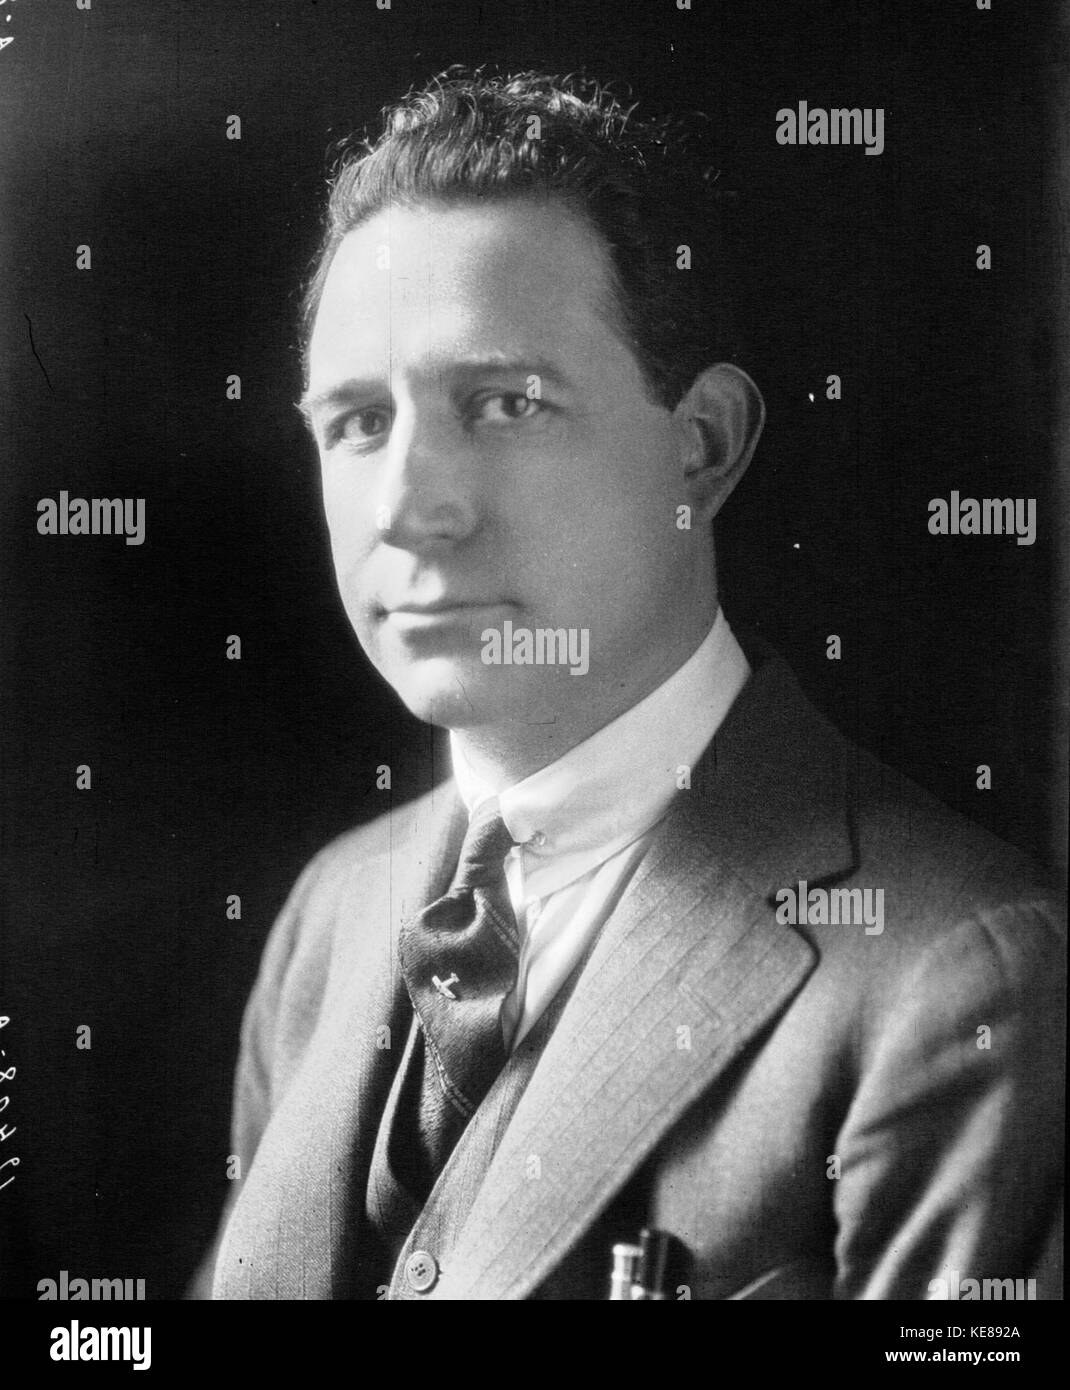 M. Bequet 1924 - Stock Image